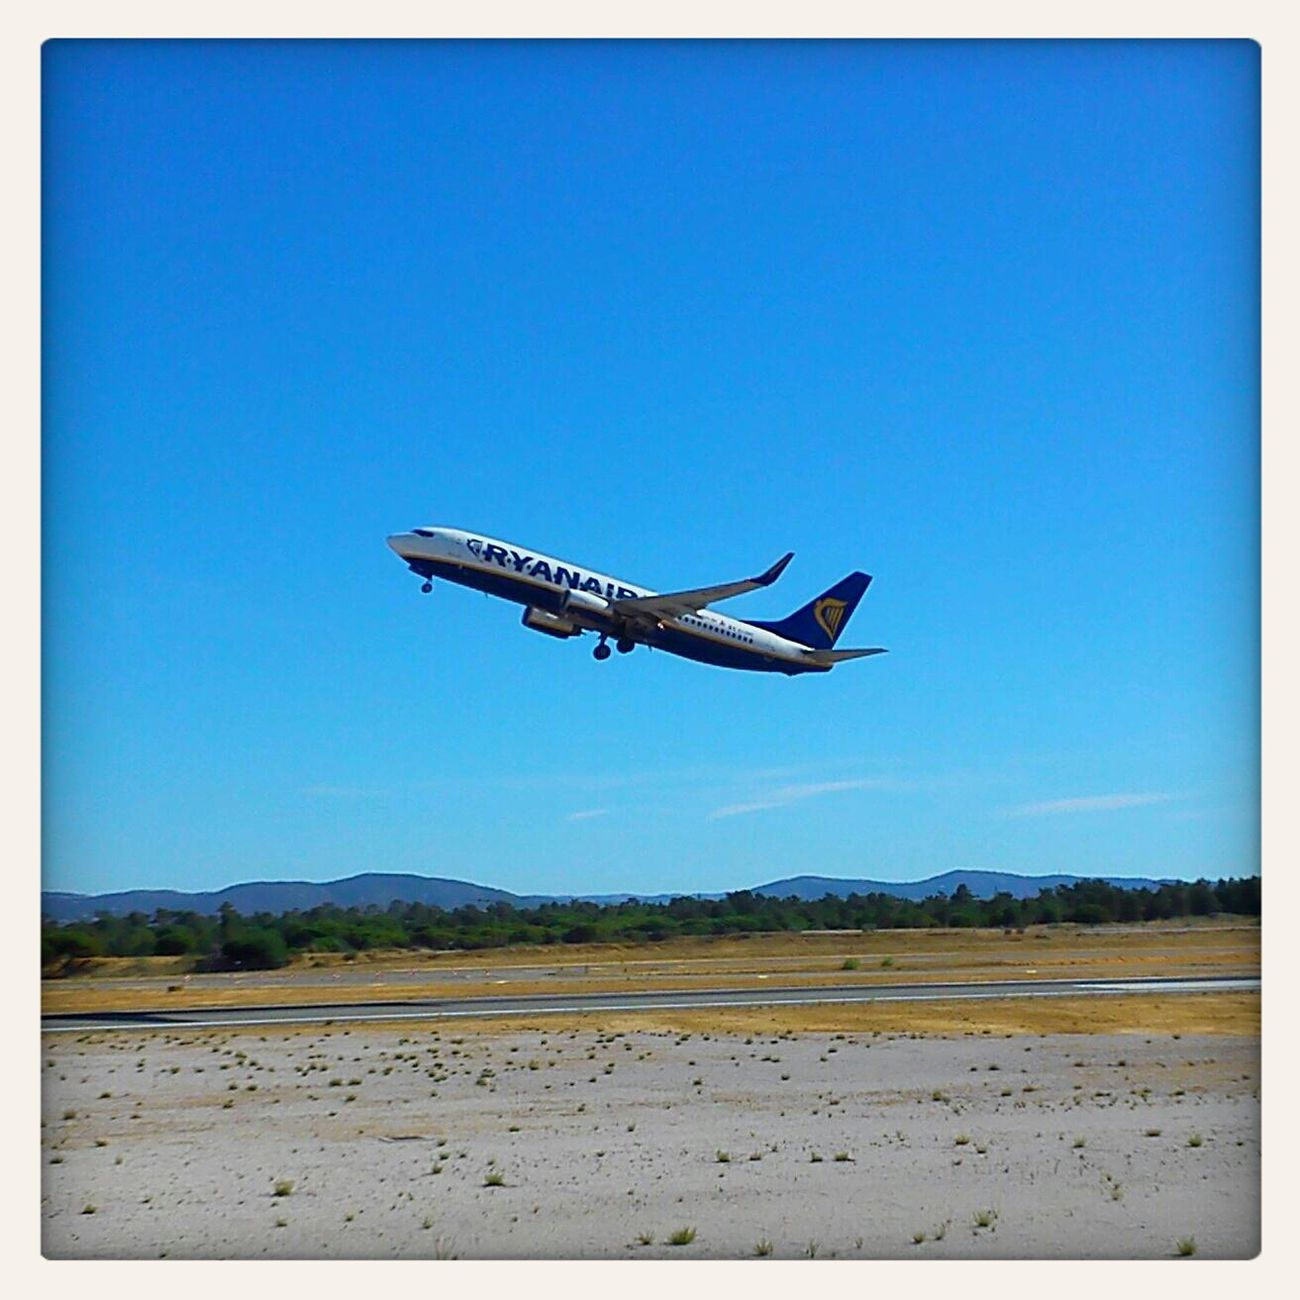 Ryanair - Airport Faro (2013/08/08)